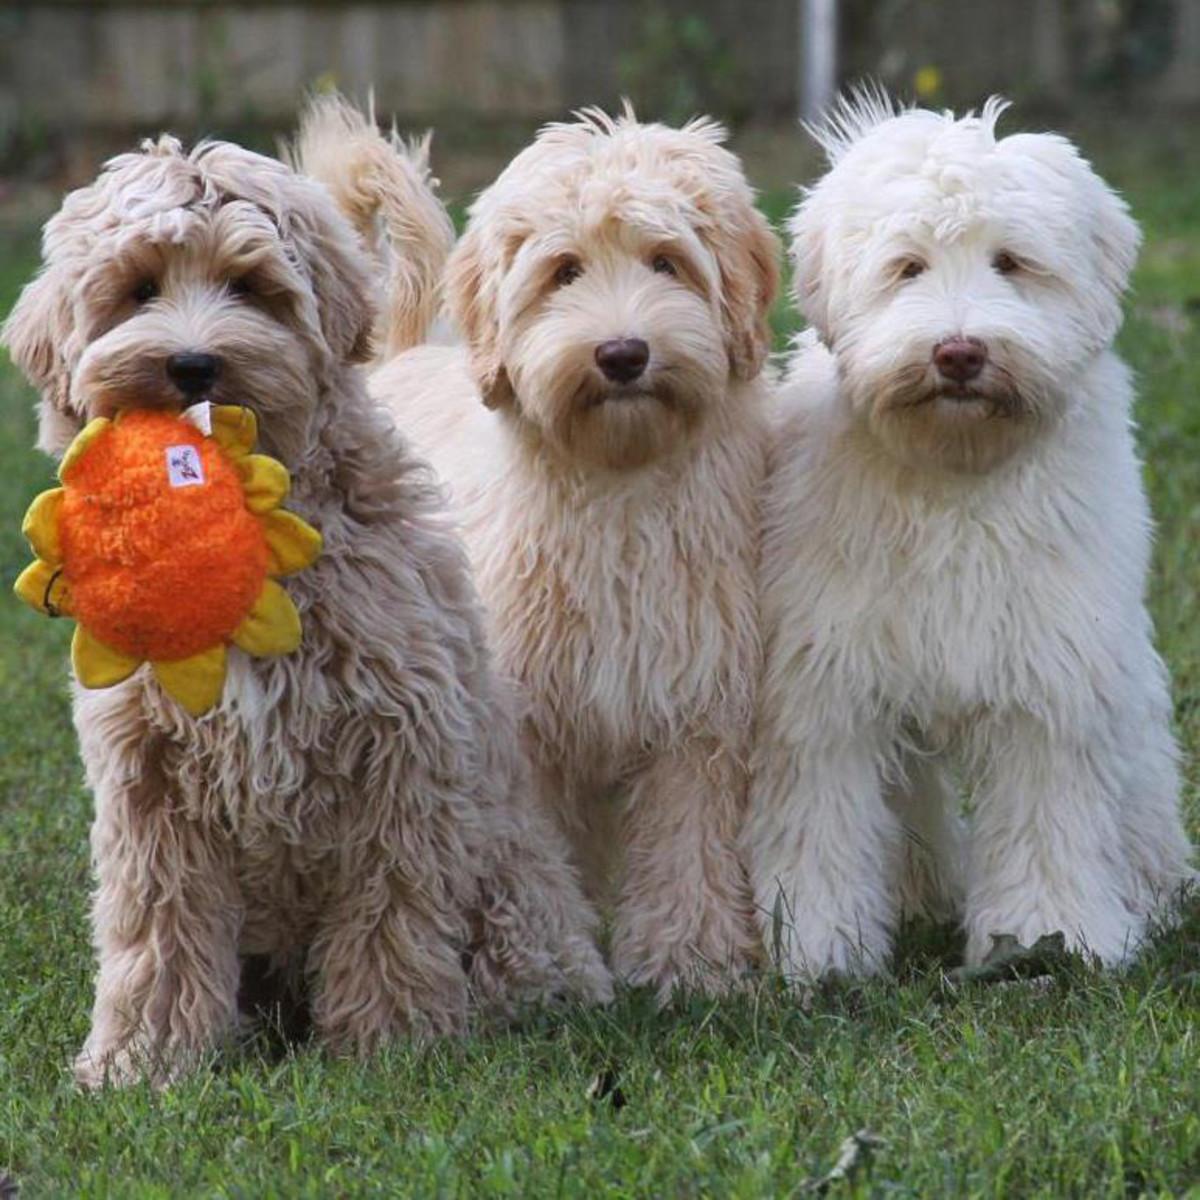 Three full-grown Australian Labradoodles